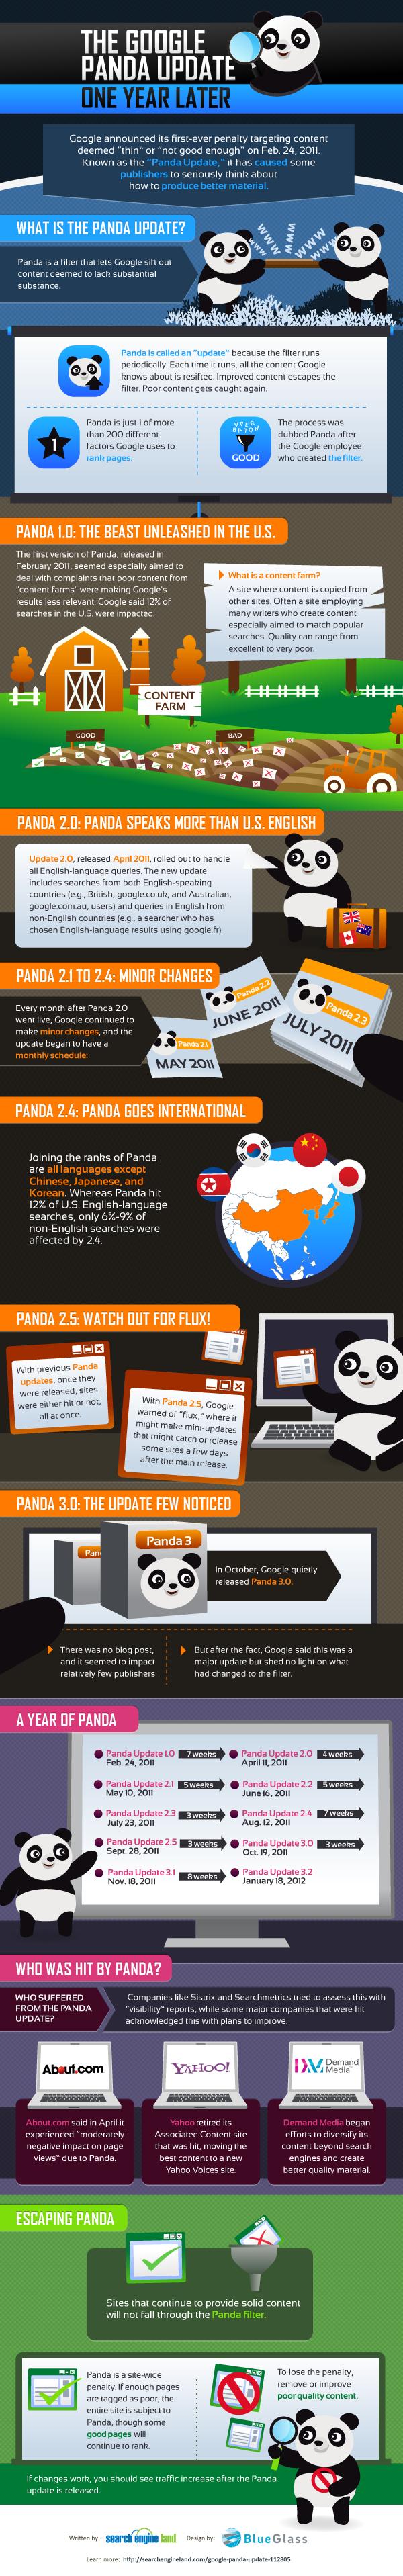 Google Panda Algorith Update